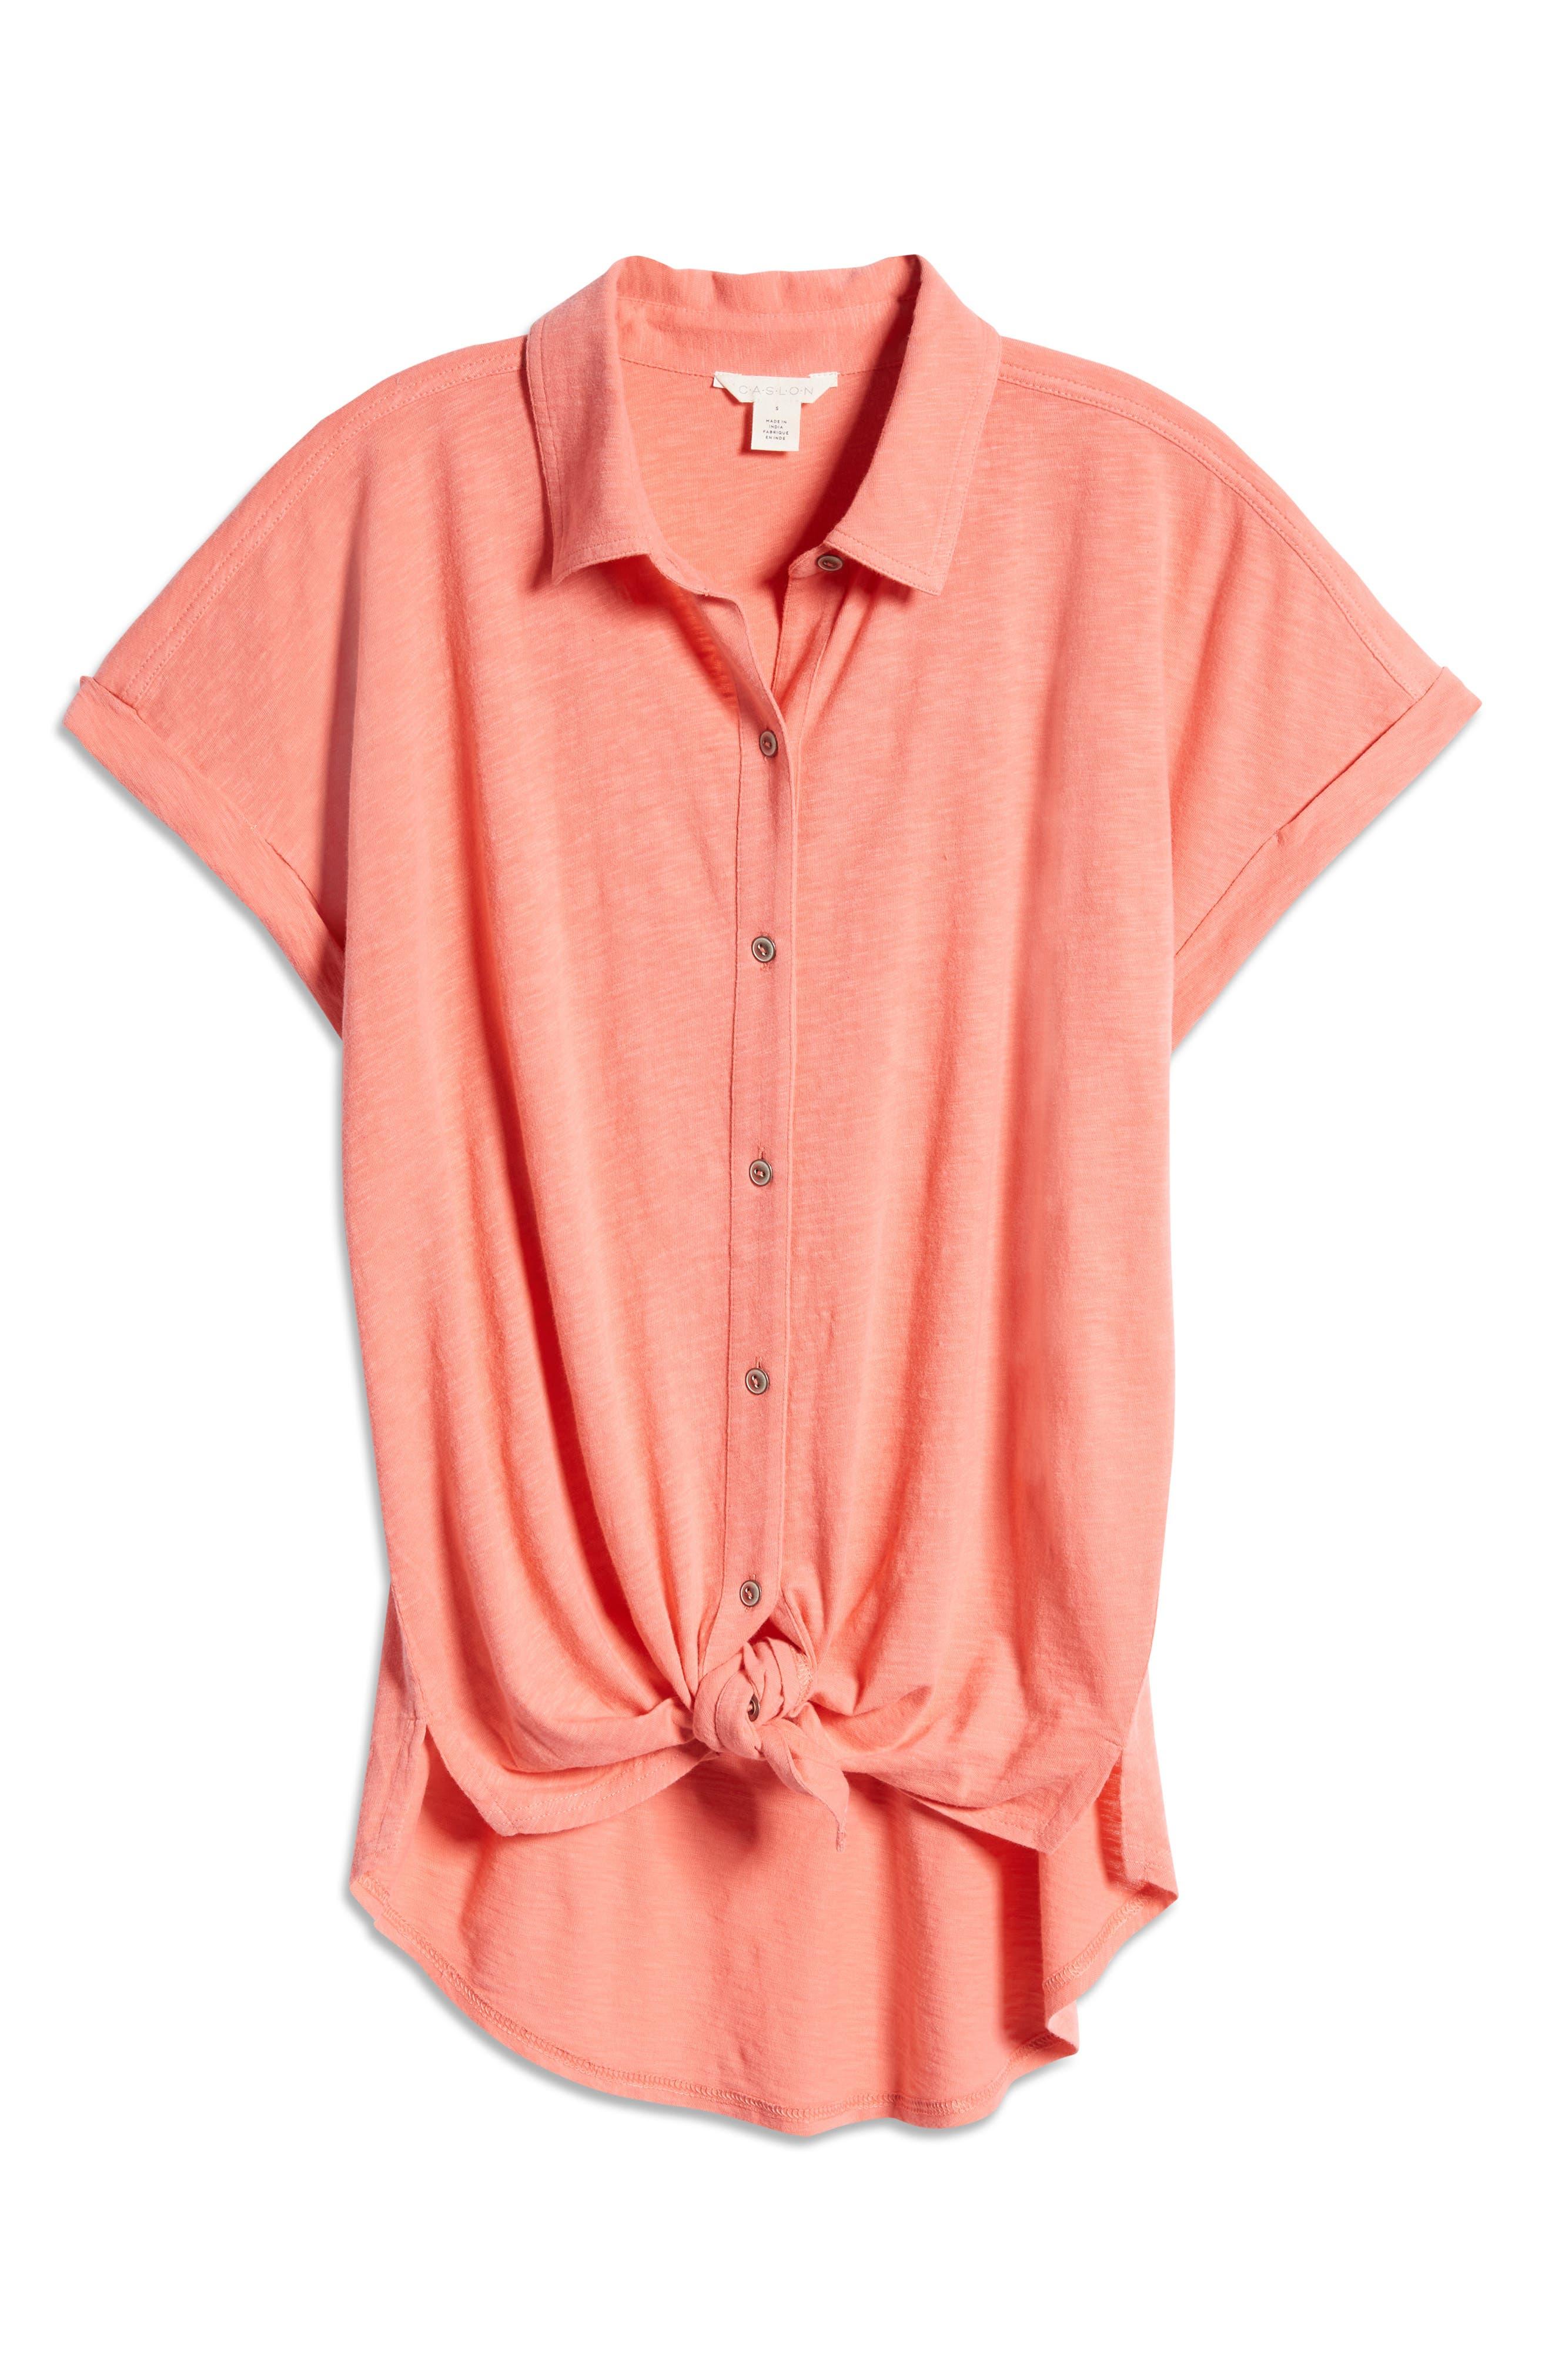 Women's Caslon Slub Jersey Camp Shirt